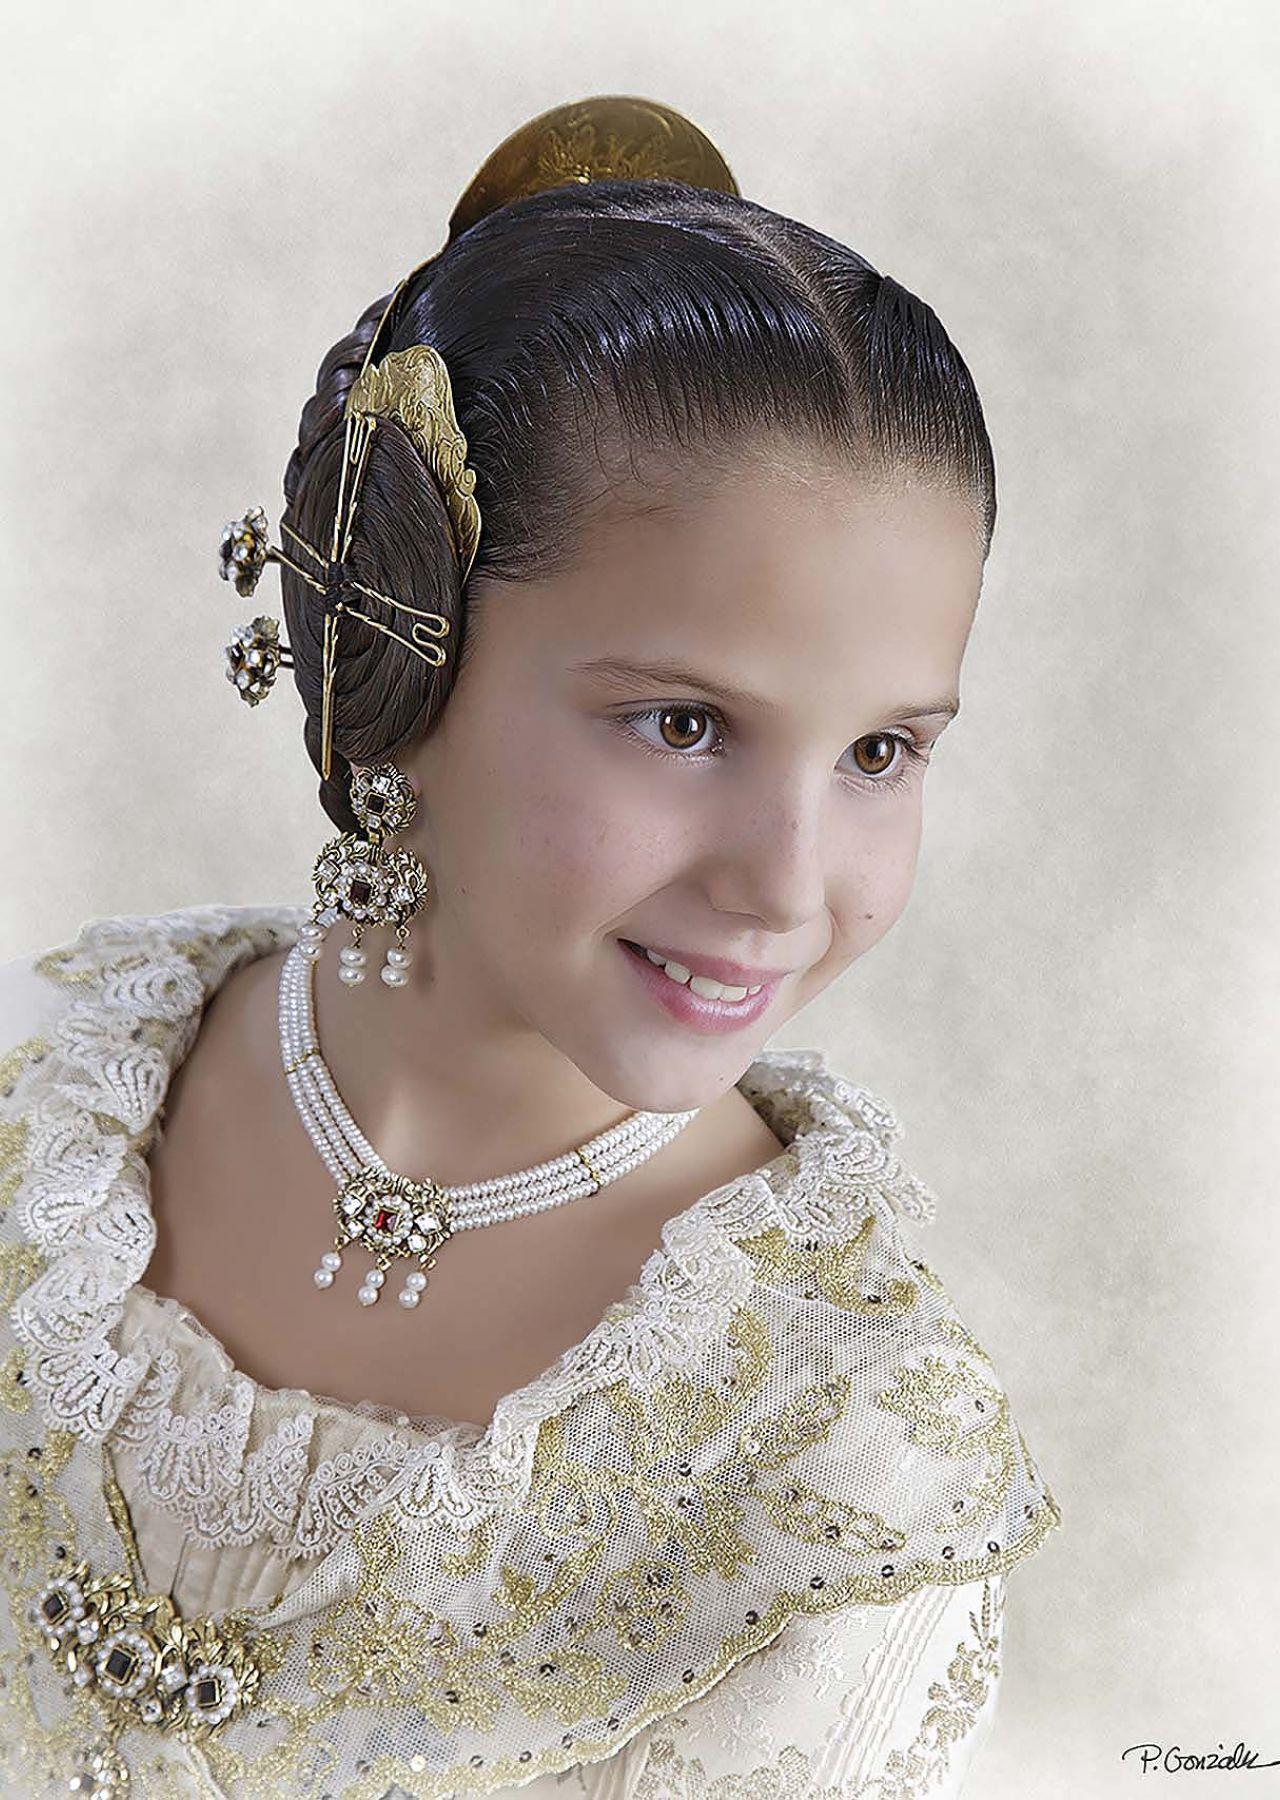 Celia Vicedo Flor